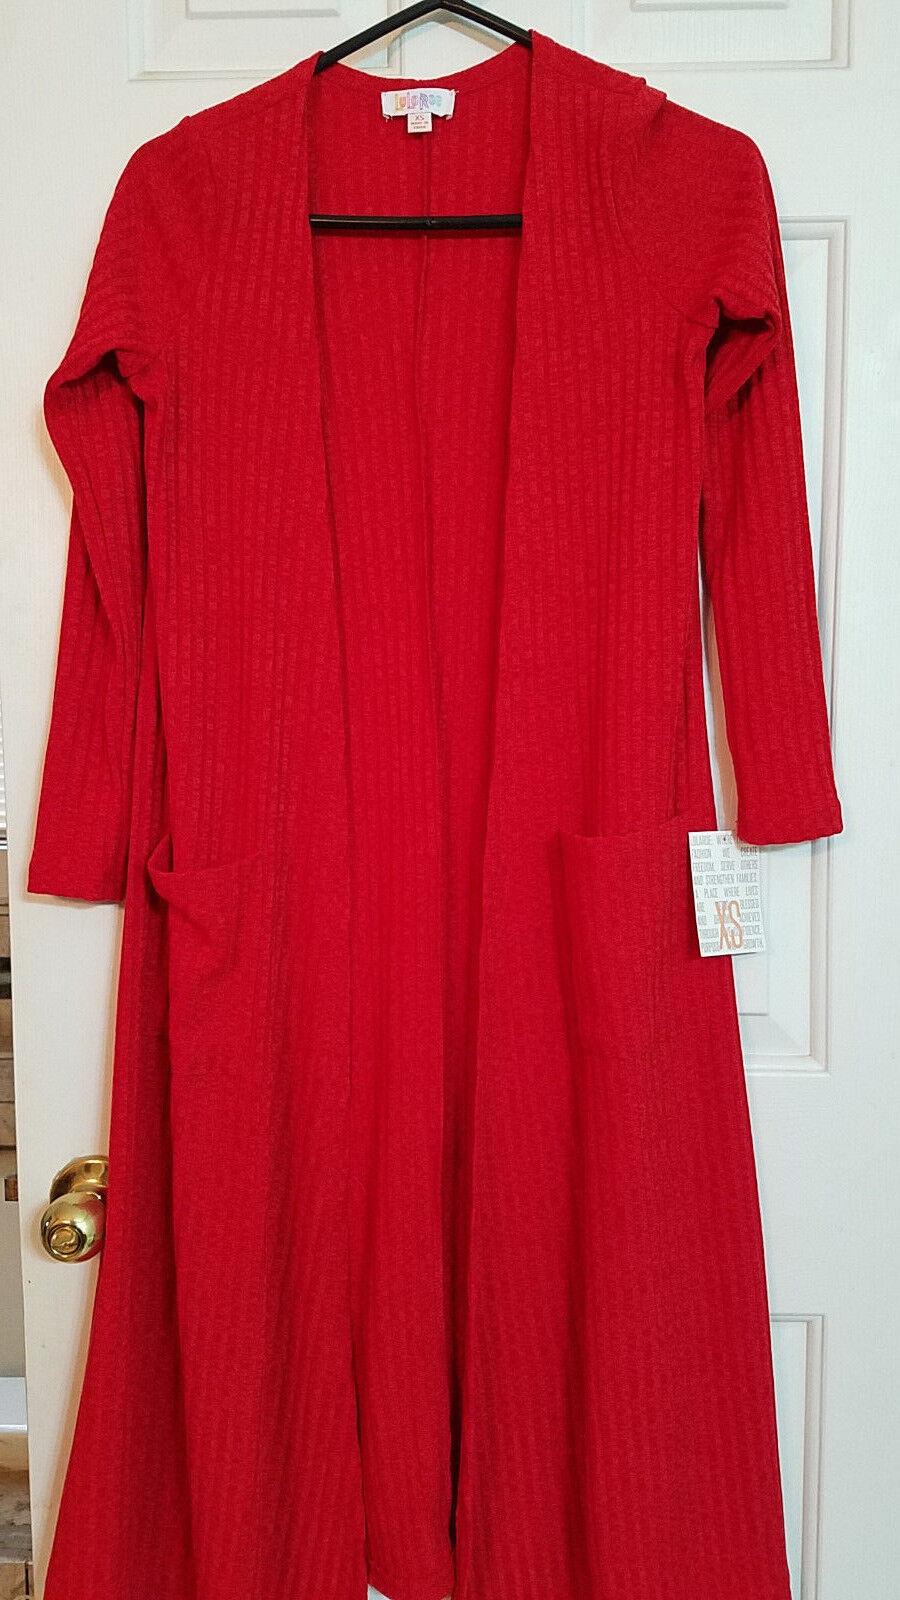 NWT LulaRoe Sarah full-length cardigan sweater, solid red ribbed material XS